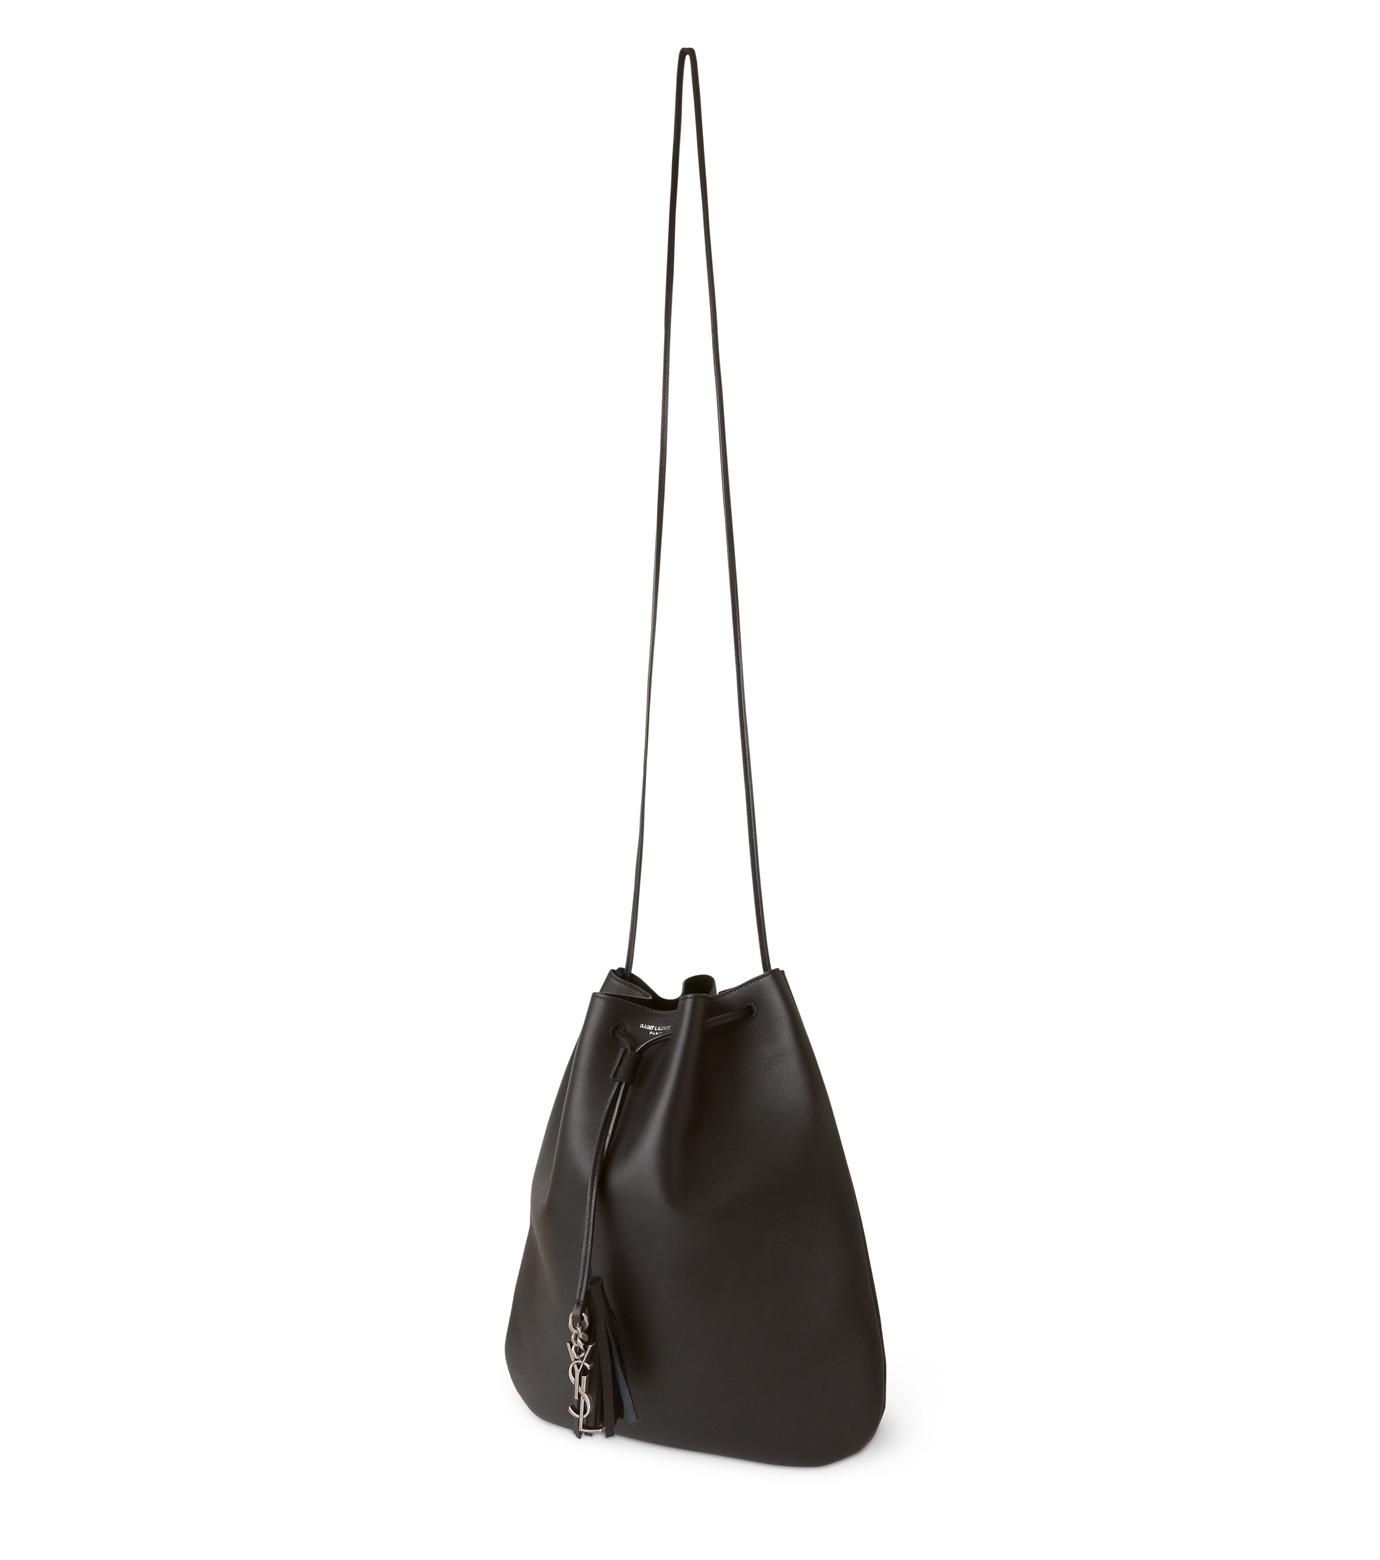 SAINT LAURENT(サンローラン)のJen Medium Flat Bag-BLACK(ショルダーバッグ/shoulder bag)-423874-BJ50D-13 拡大詳細画像2